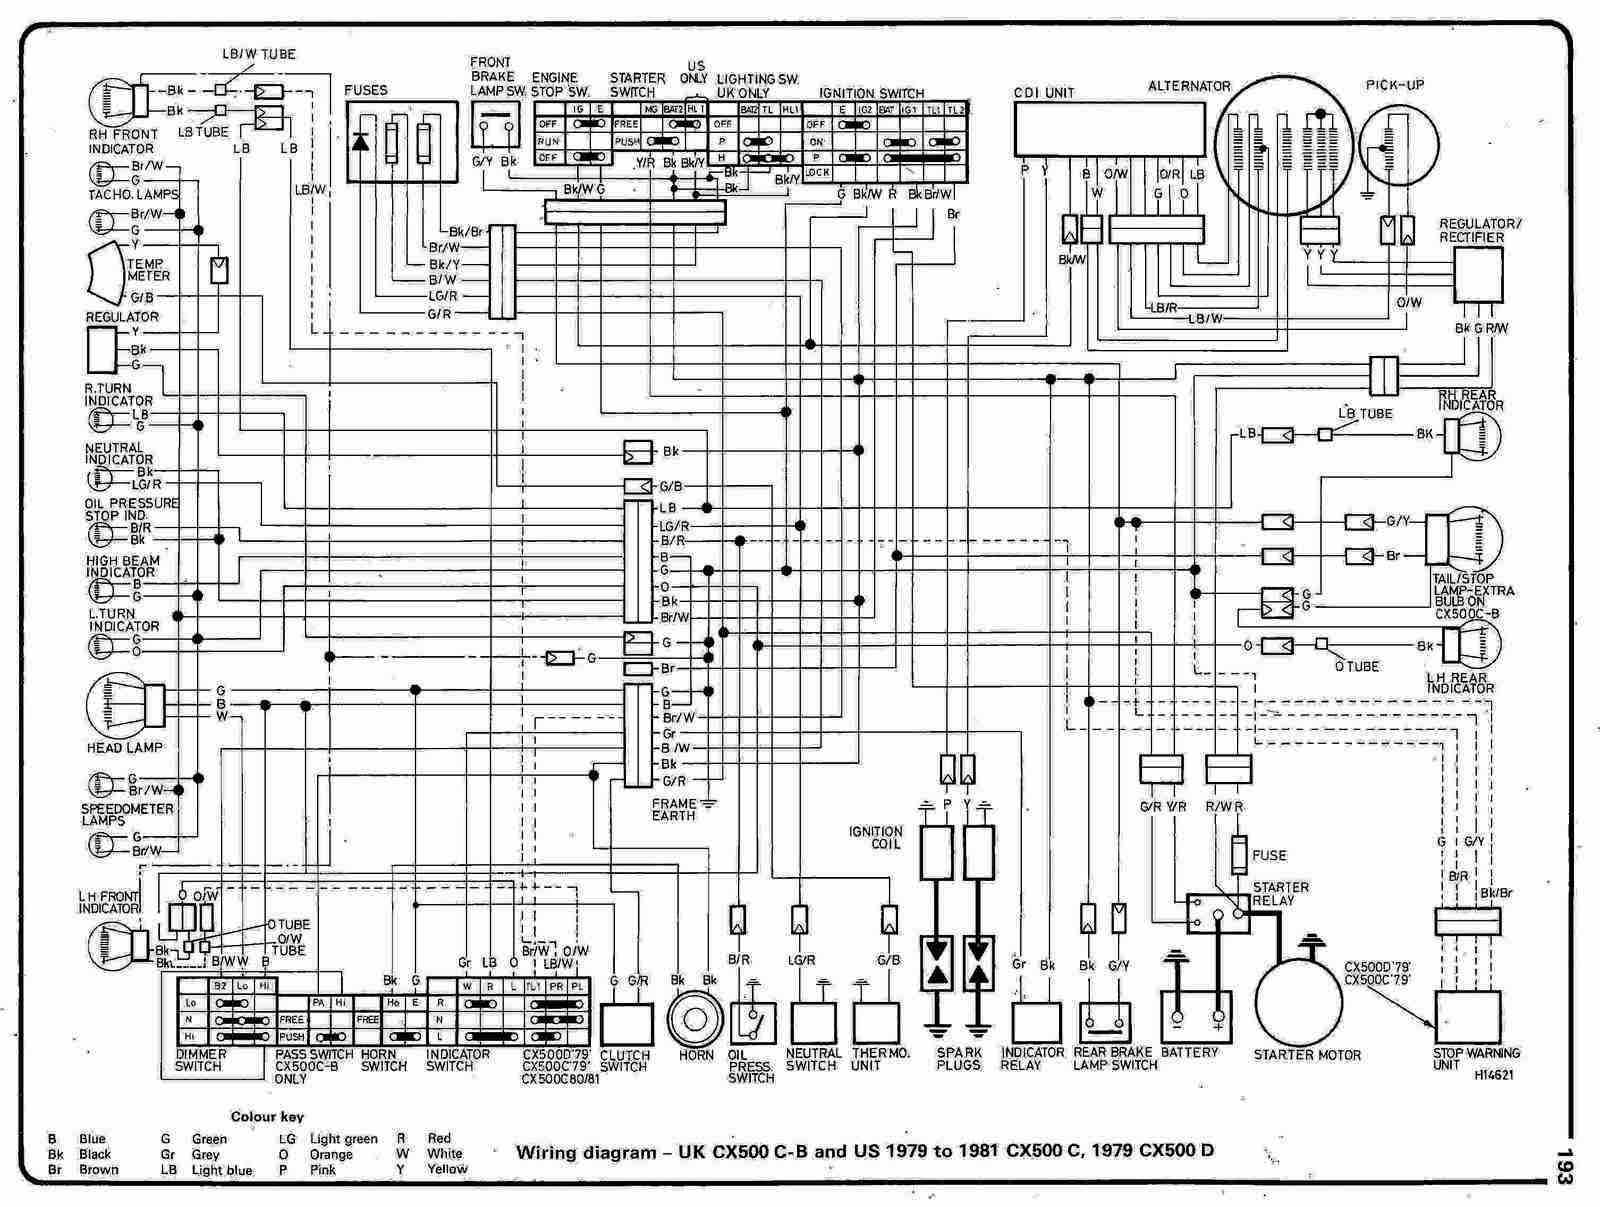 medium resolution of honda cx500 c motorcycle 1979 1981 and cx500 d 1979 1979 honda xl250 wiring diagram 1979 honda cb750 wiring diagram